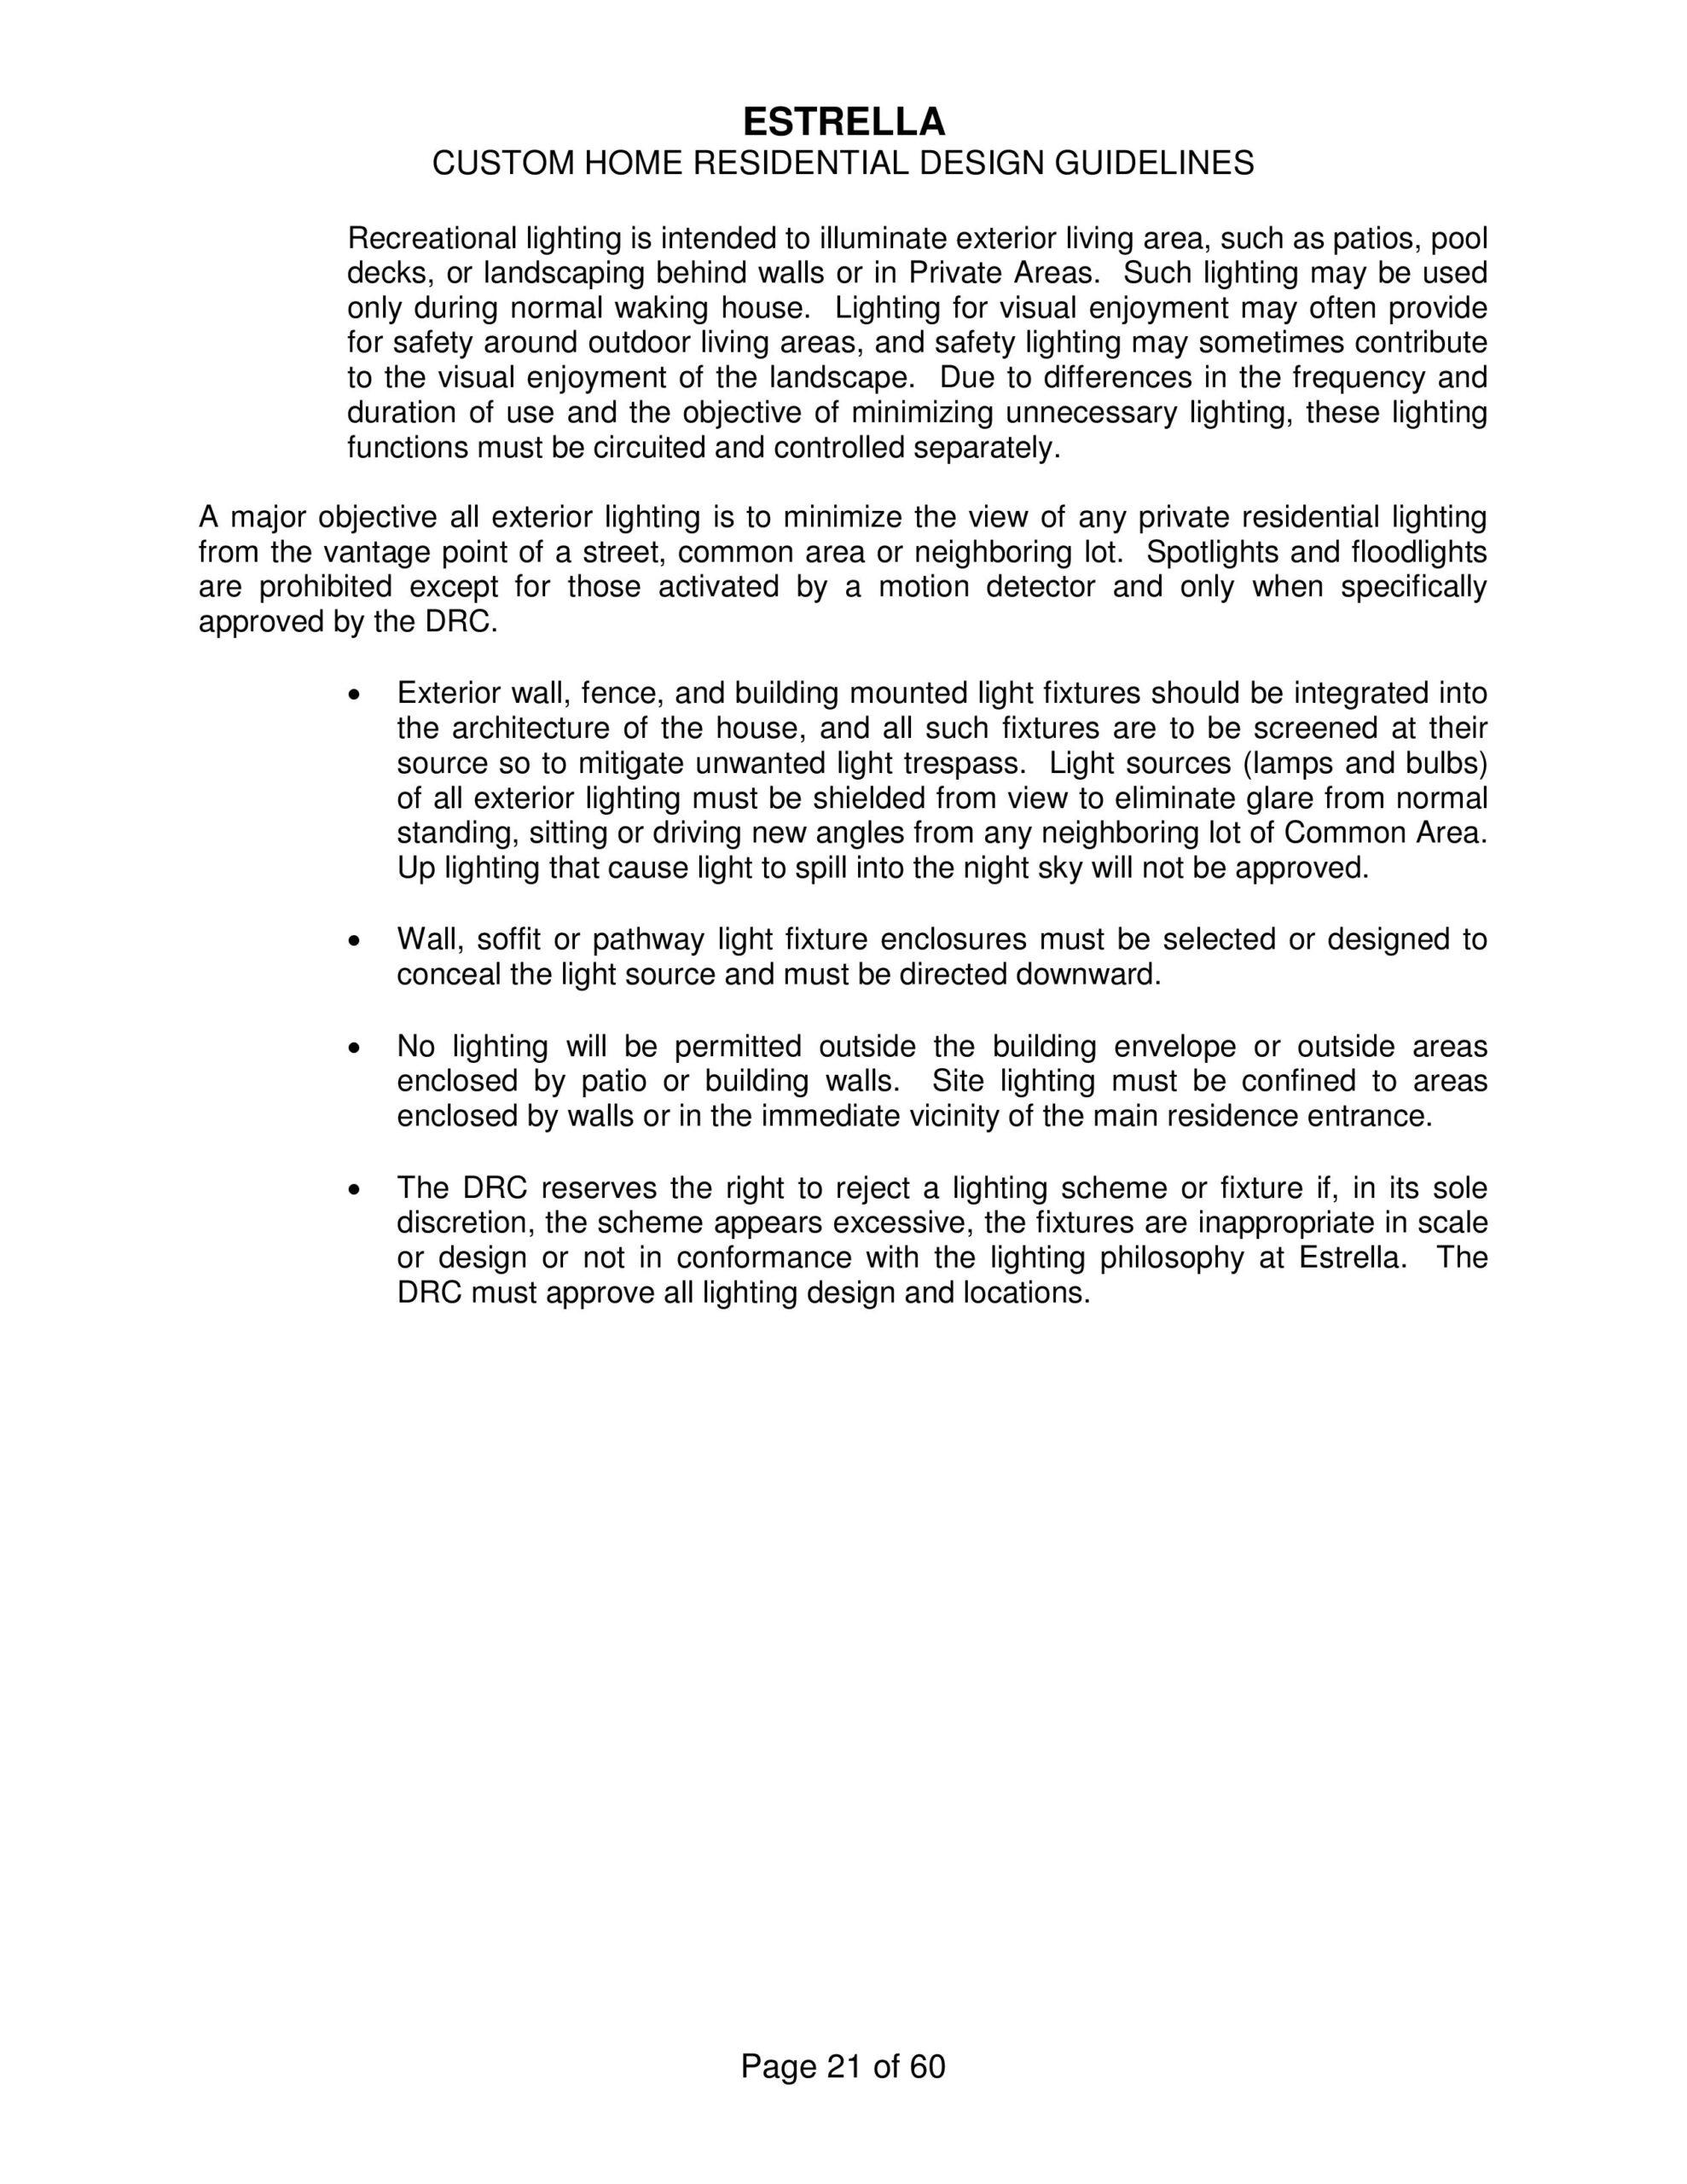 ESTRELLA MOUNTAIN CUSTOM HOME GUIDELINES-page-025